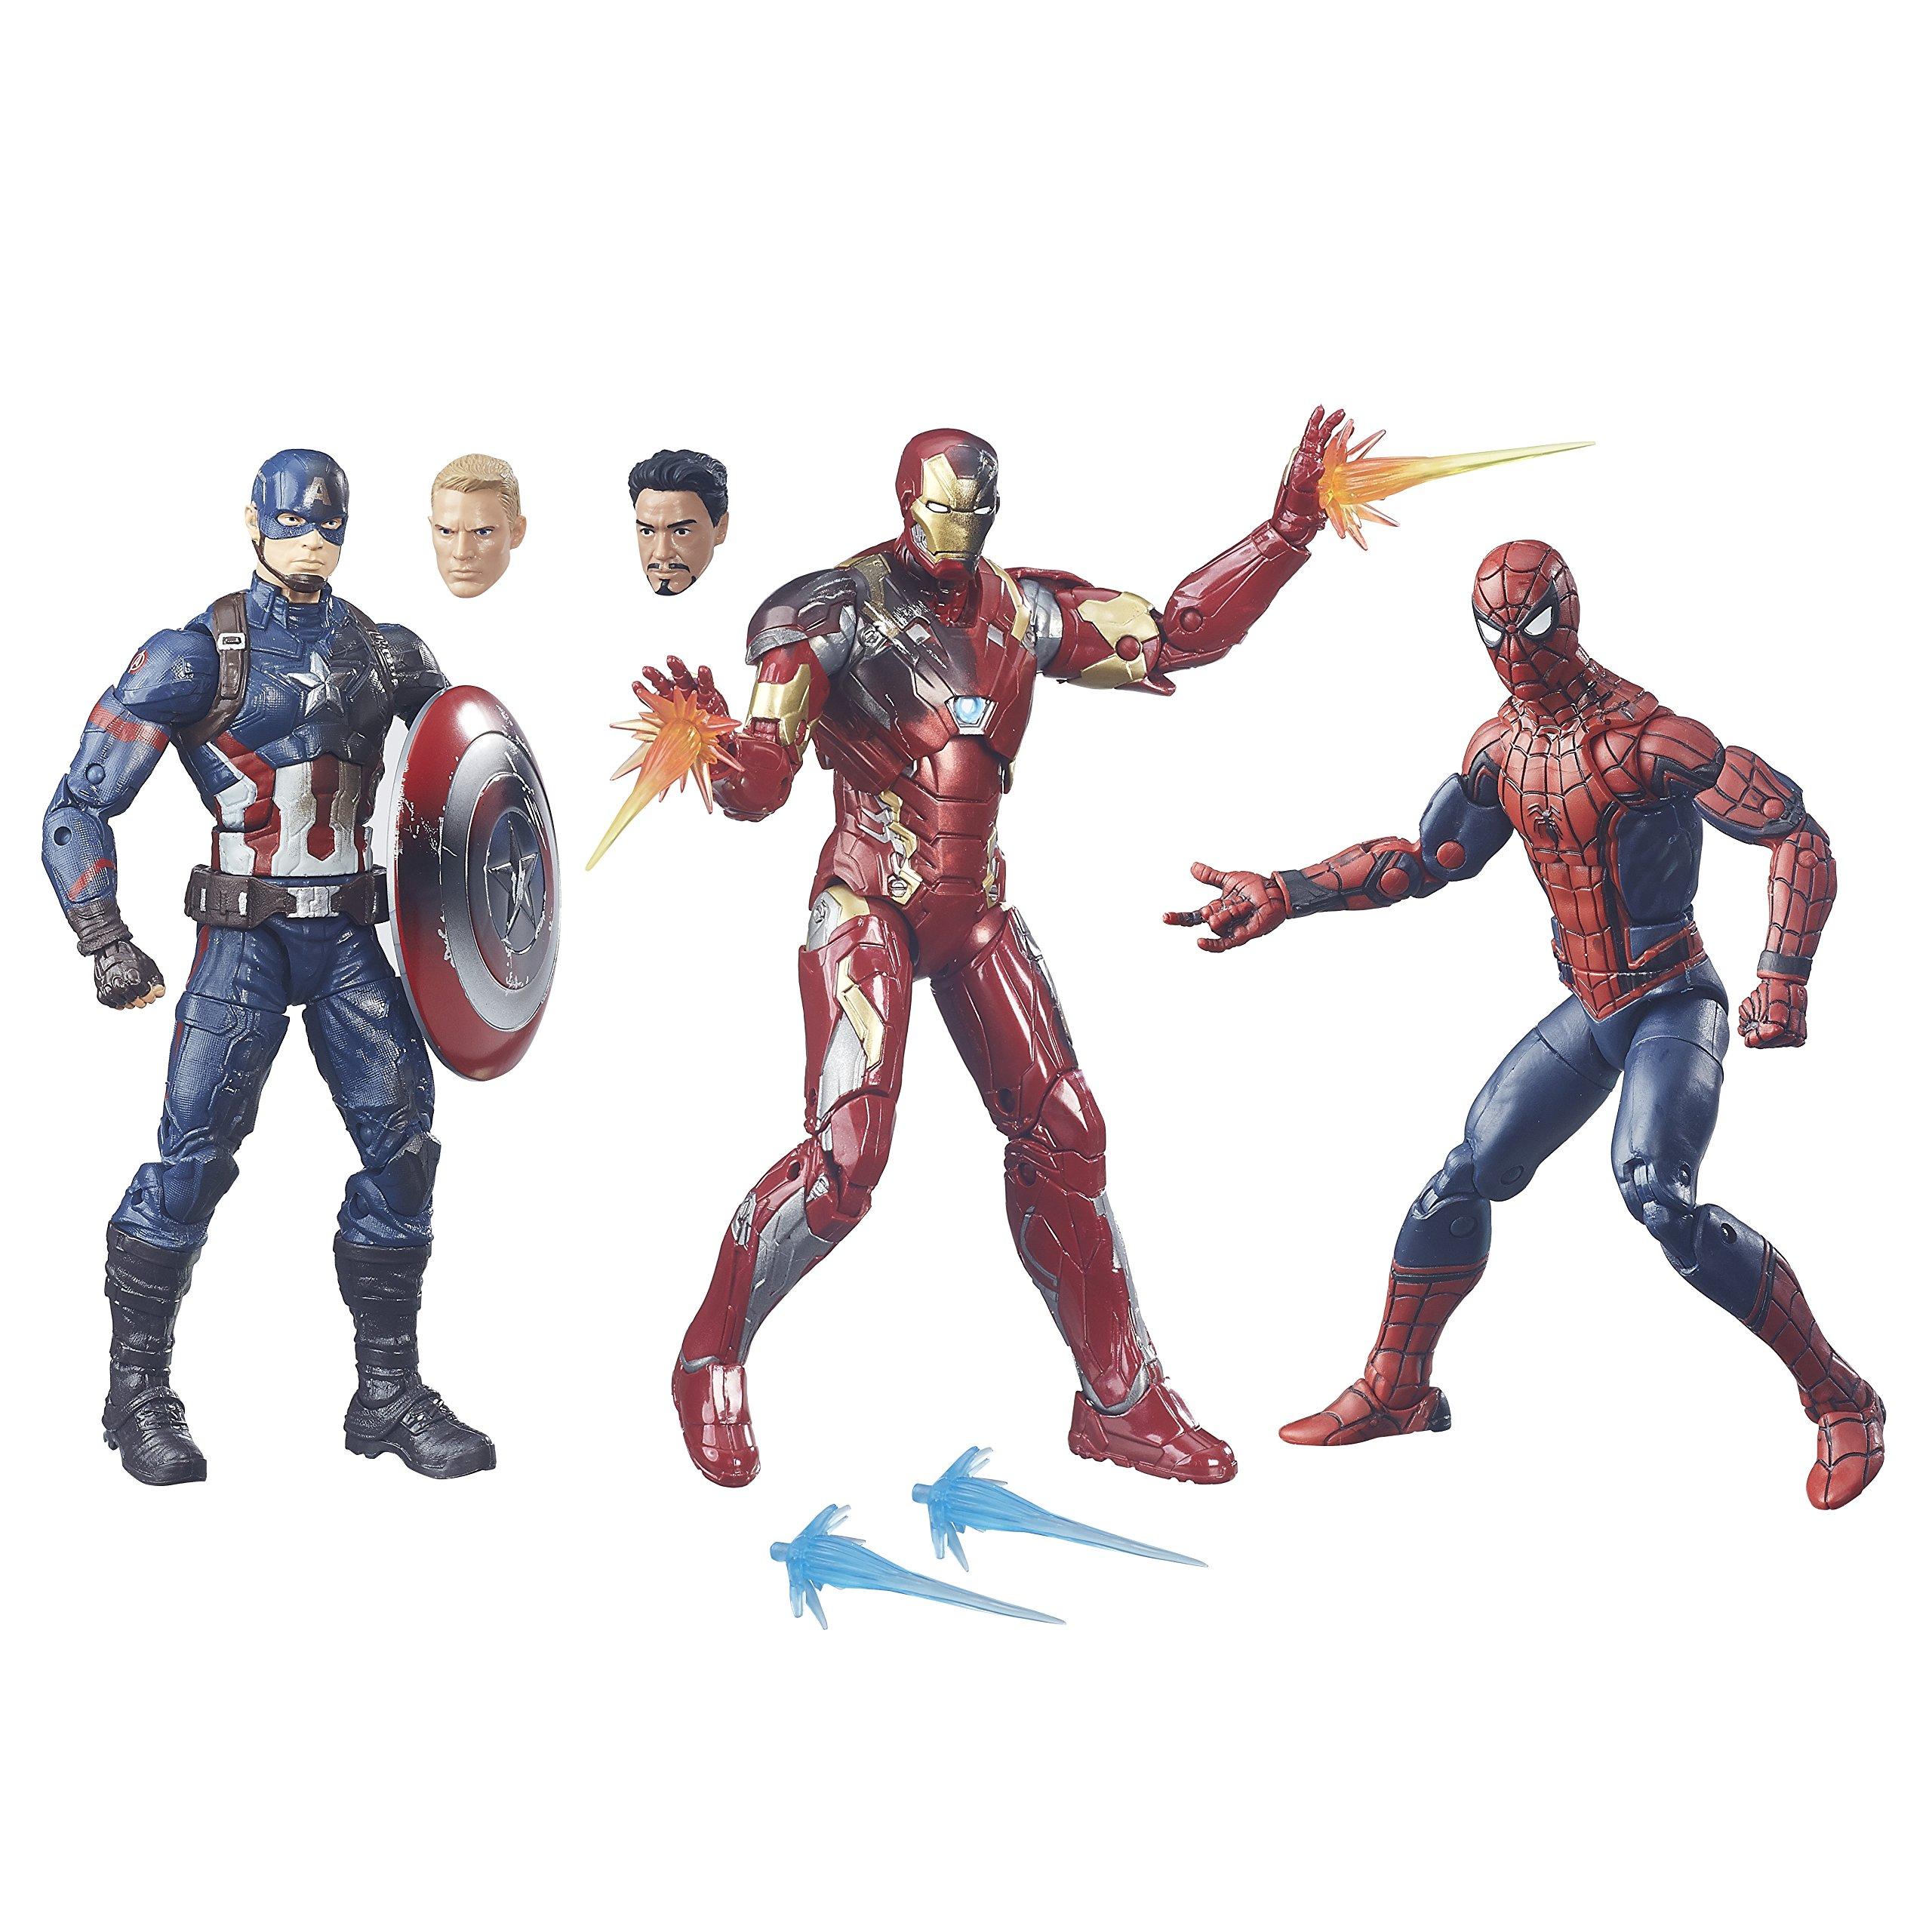 Marvel Legends Captain America: Civil War 6-inch Figure 3-Pack